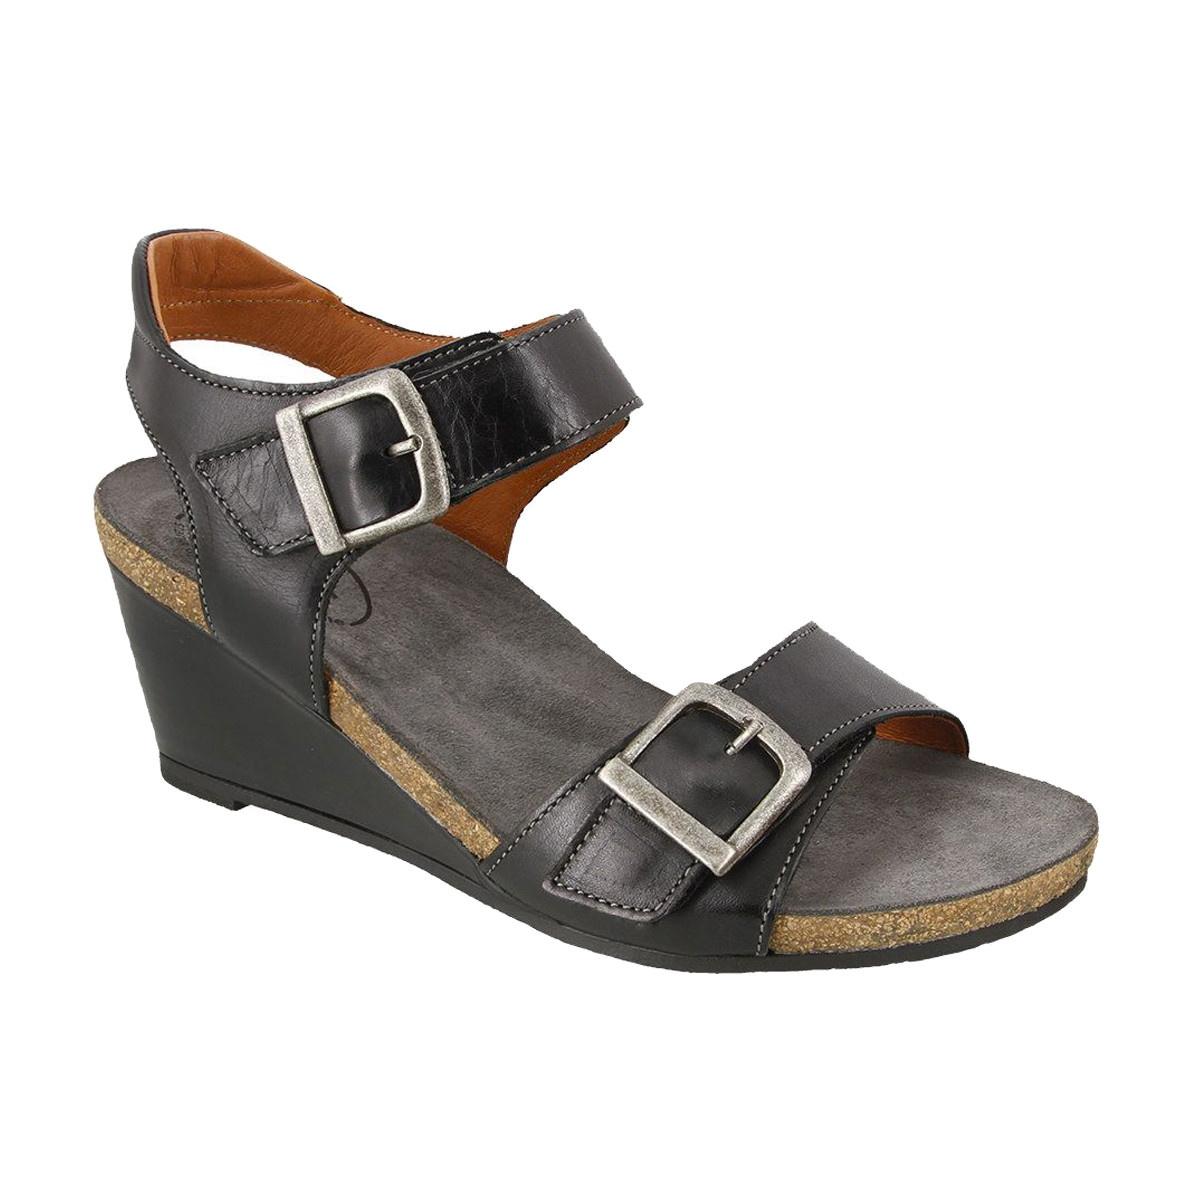 Taos Footwear Taos Women's Buckle Up Black